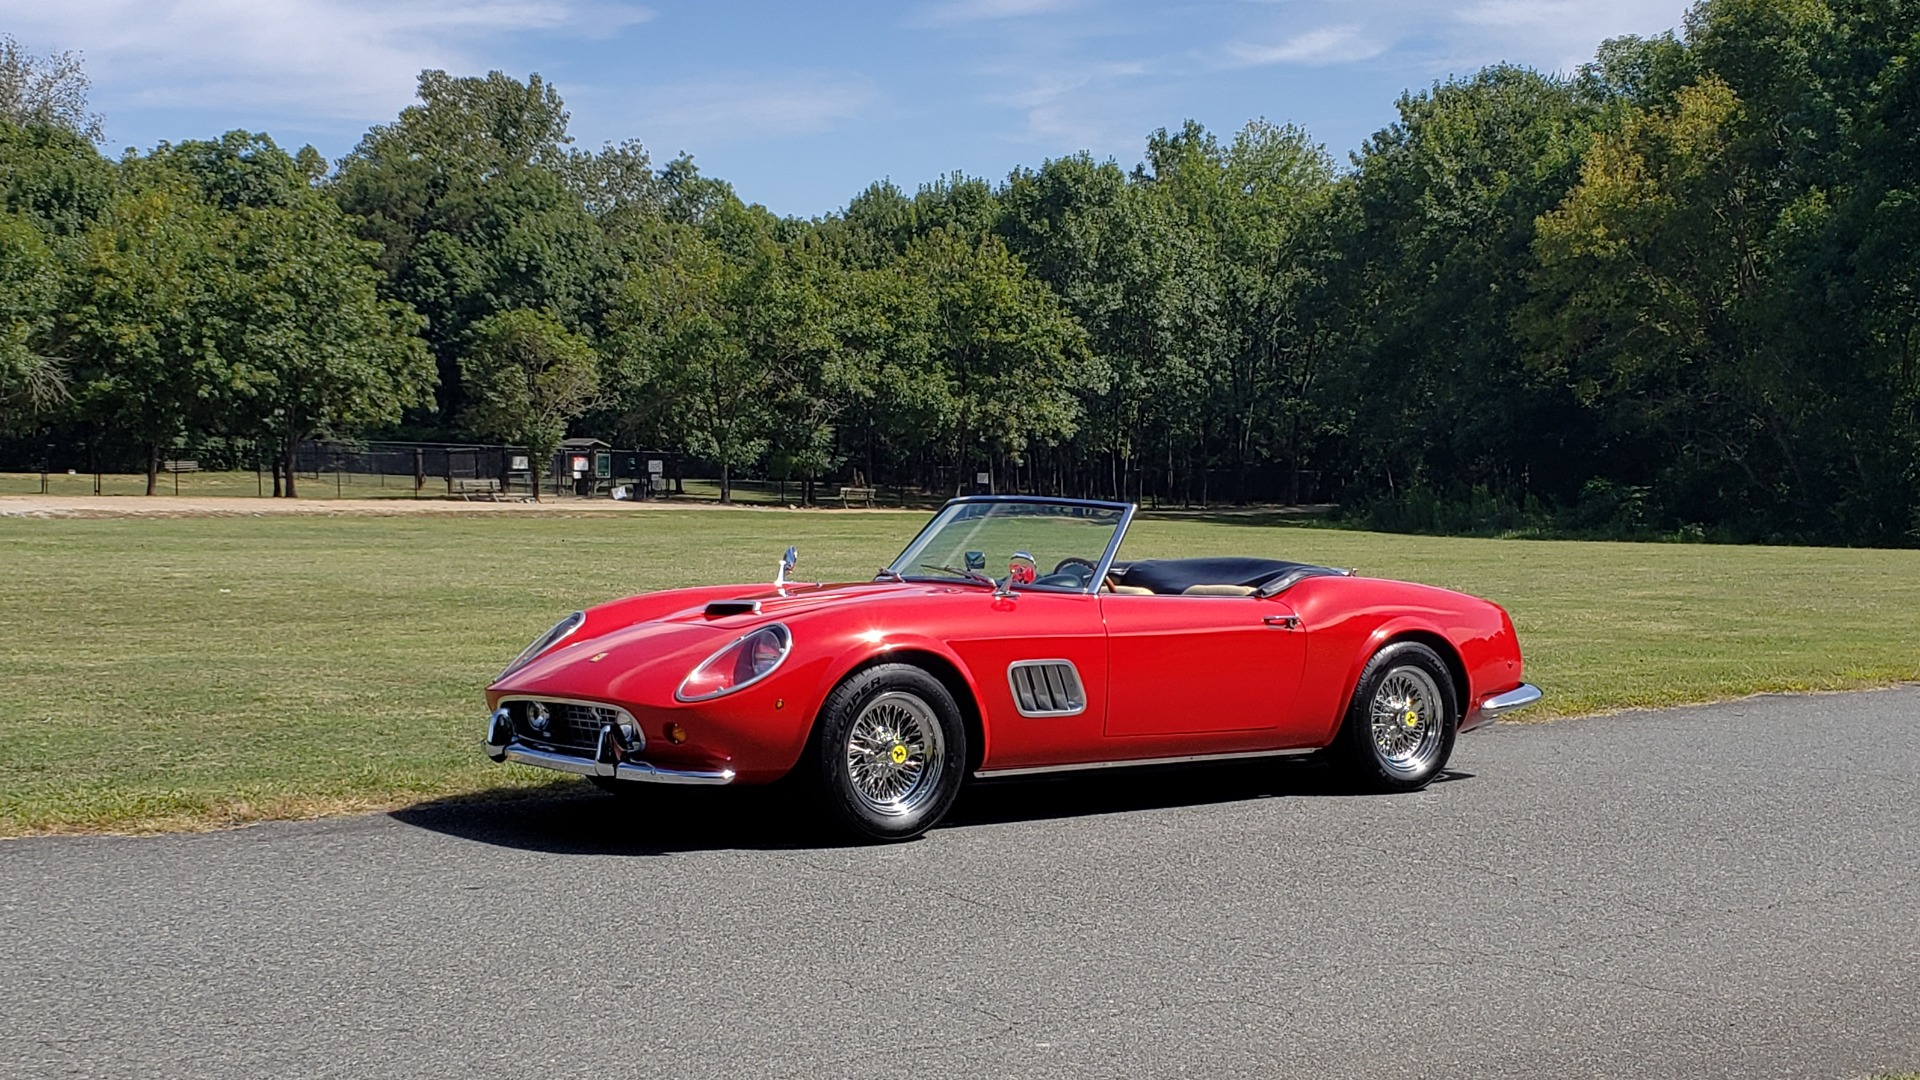 Used 1961 Ferrari 250GT SWB CALIFORNIA REPLICA / 302CI V8 / TREMEC 5-SPEED for sale Sold at Formula Imports in Charlotte NC 28227 14